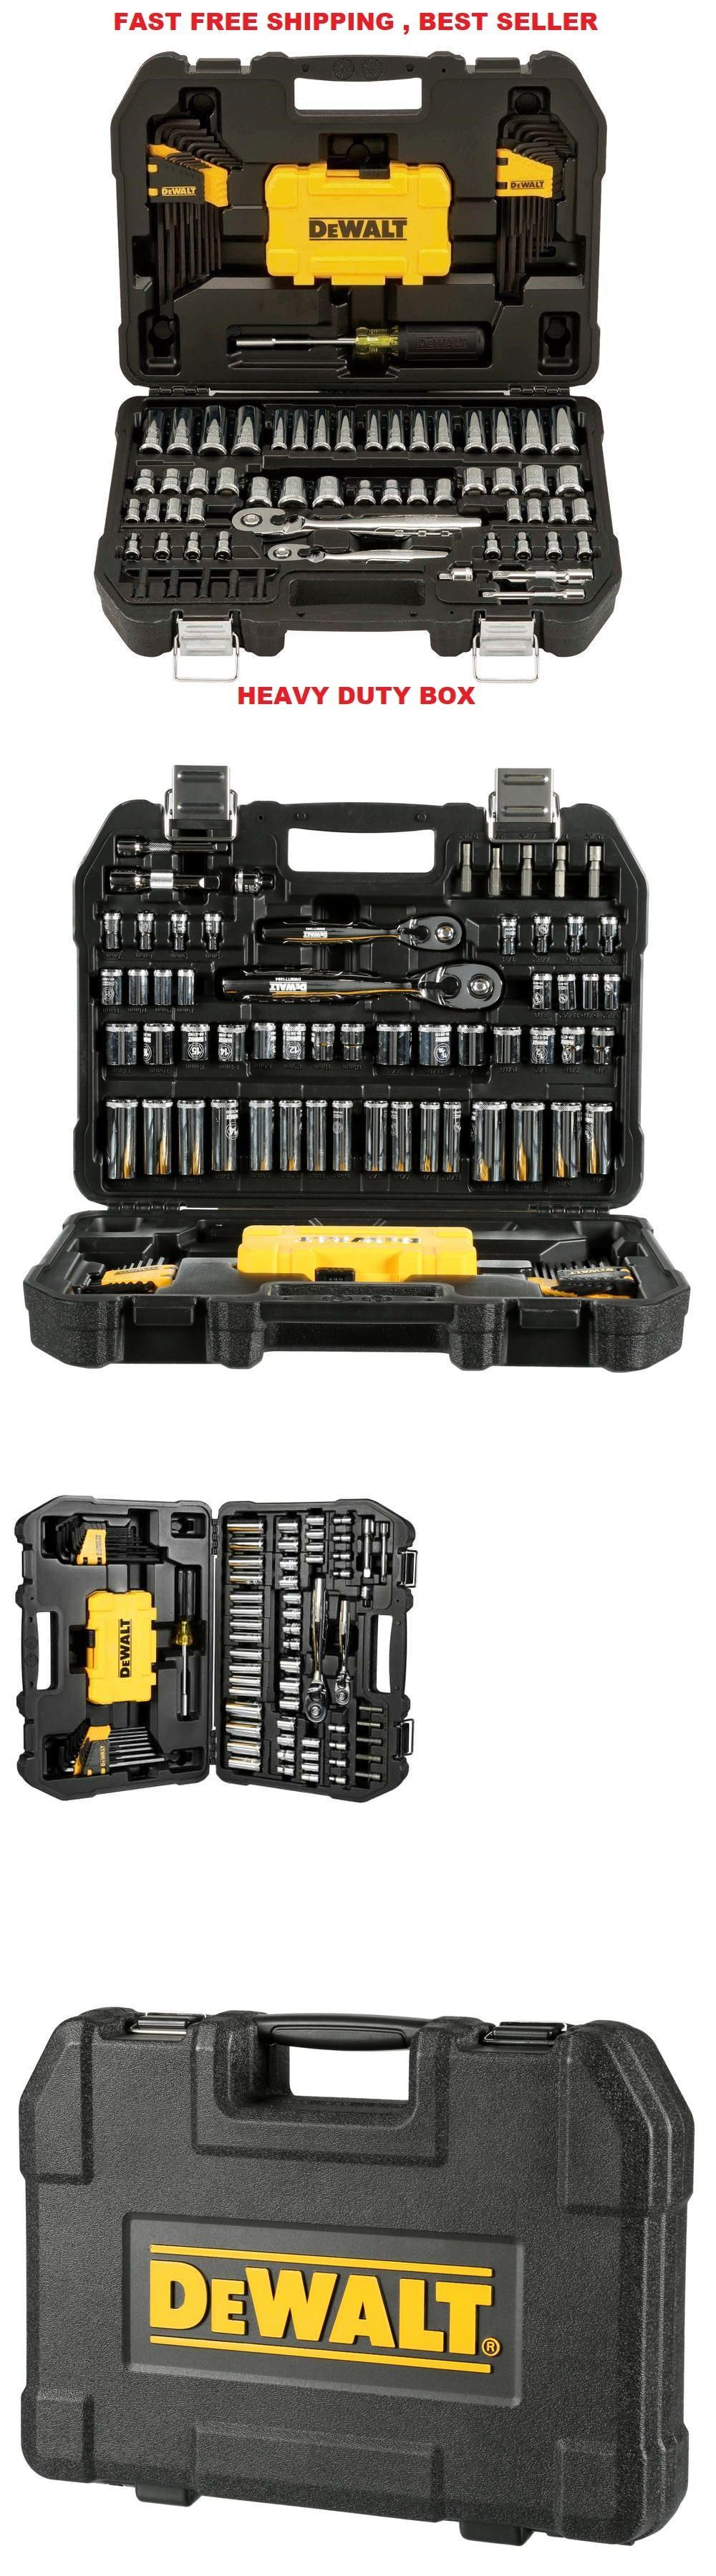 1e1398bcc25 Polished Chrome · Hand Tool Sets 23782  Mechanics Tool Set Dewalt 1 4 In. X  3 8